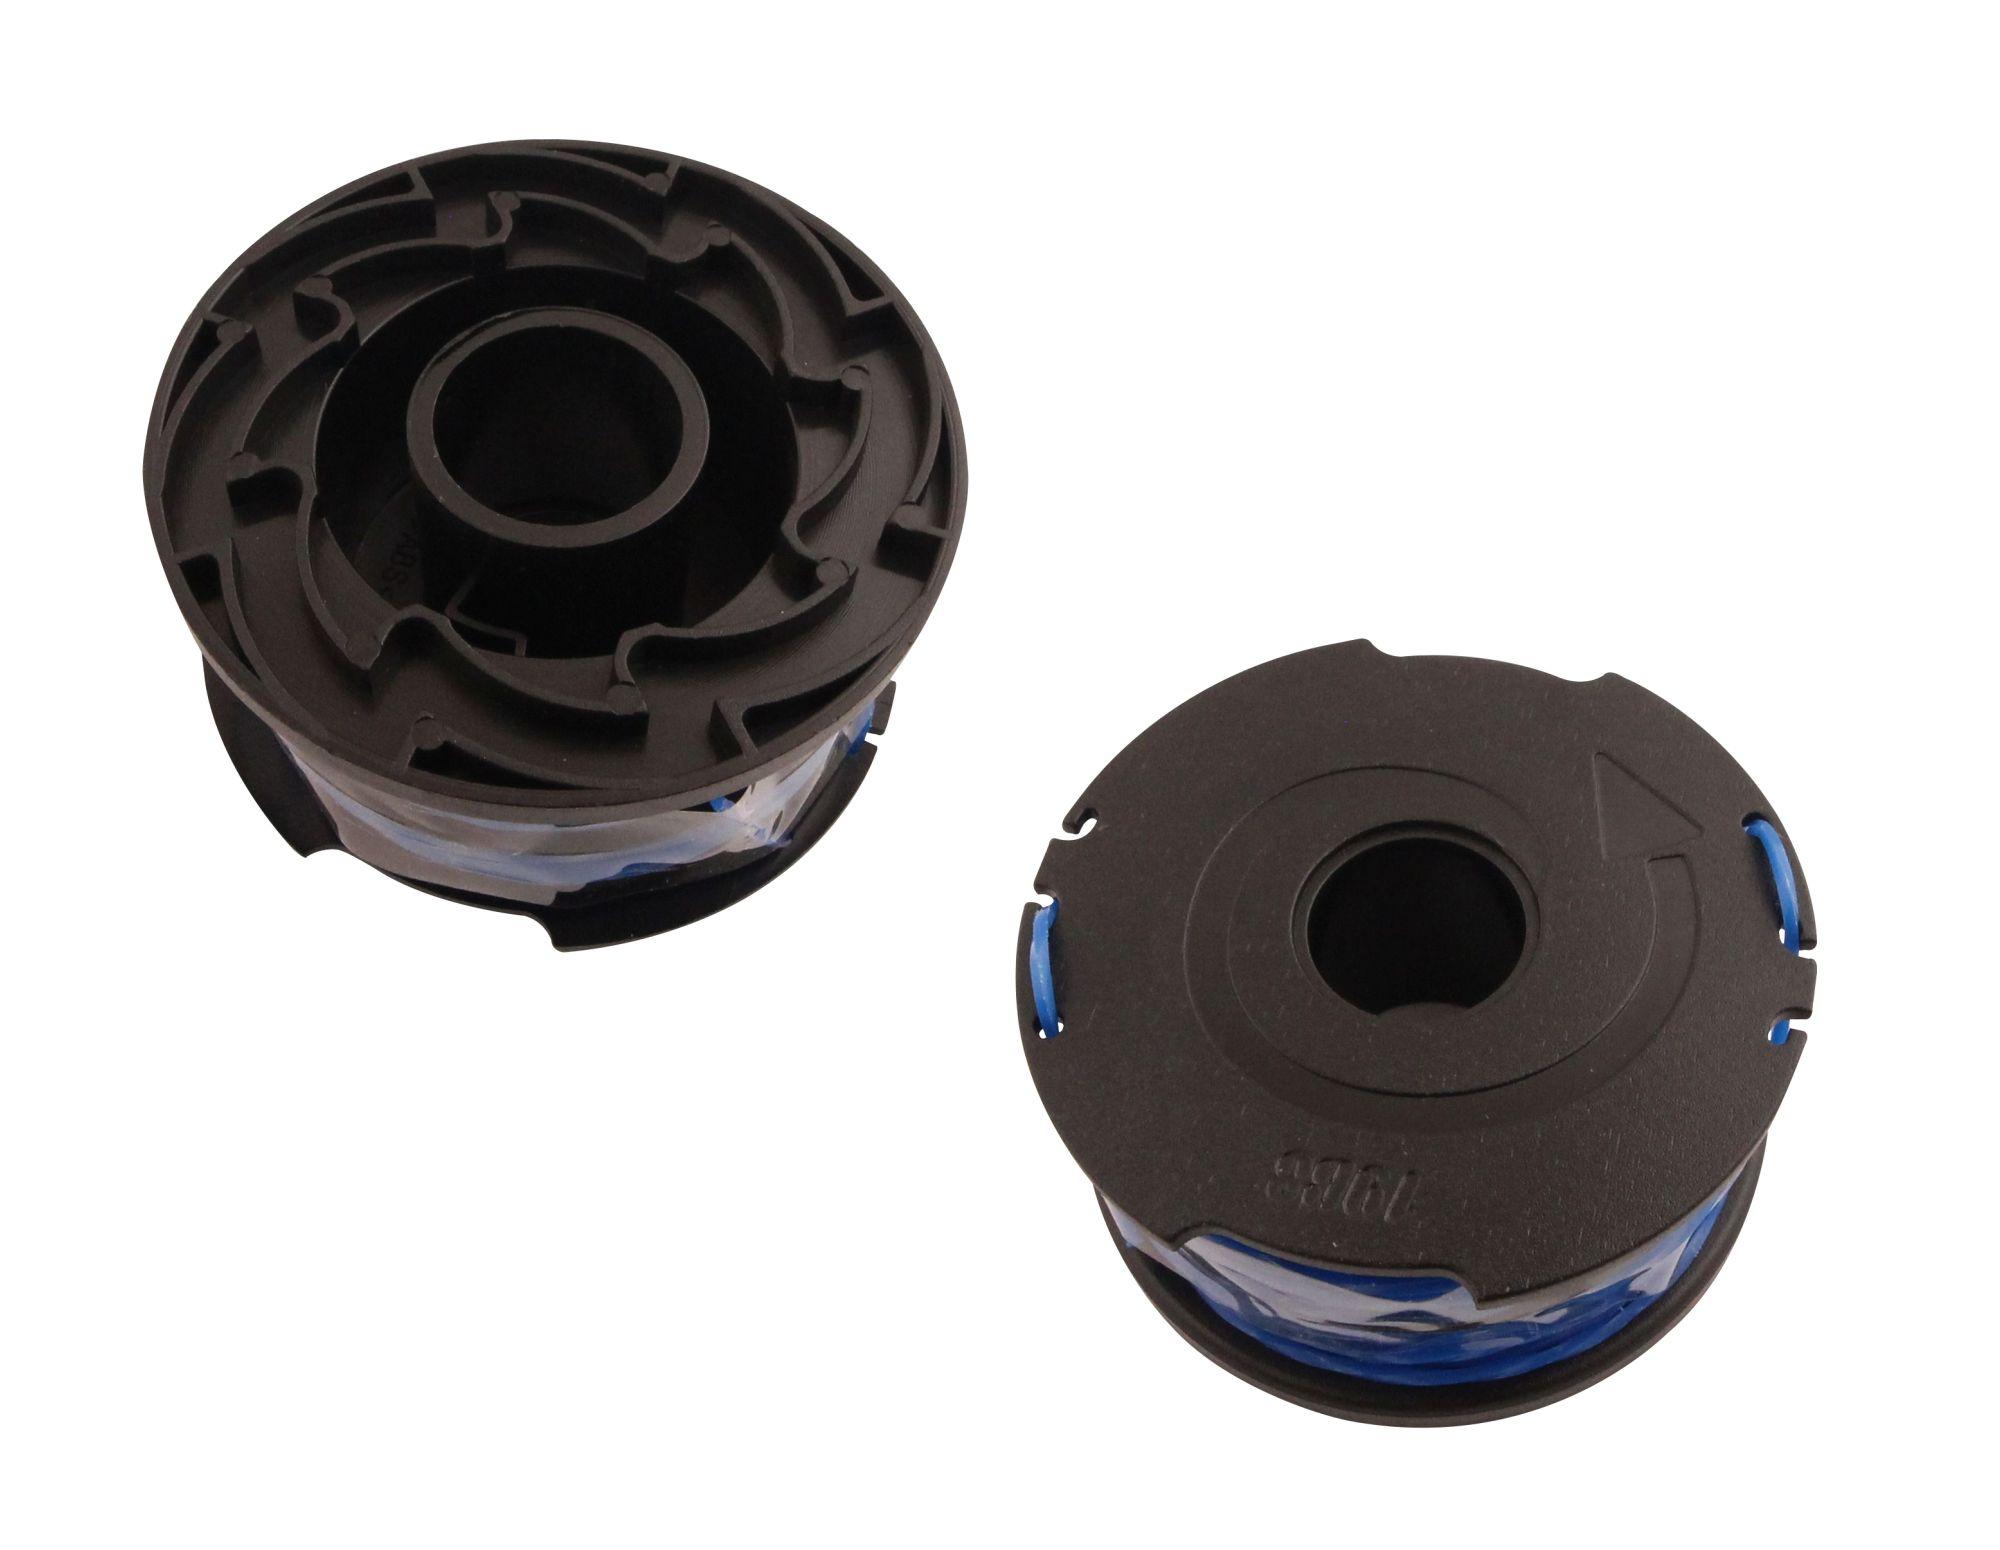 Black /& Decker Chaîne rotofil Bobine et Ligne X 3 GLC3000 GLC3630L NST2018